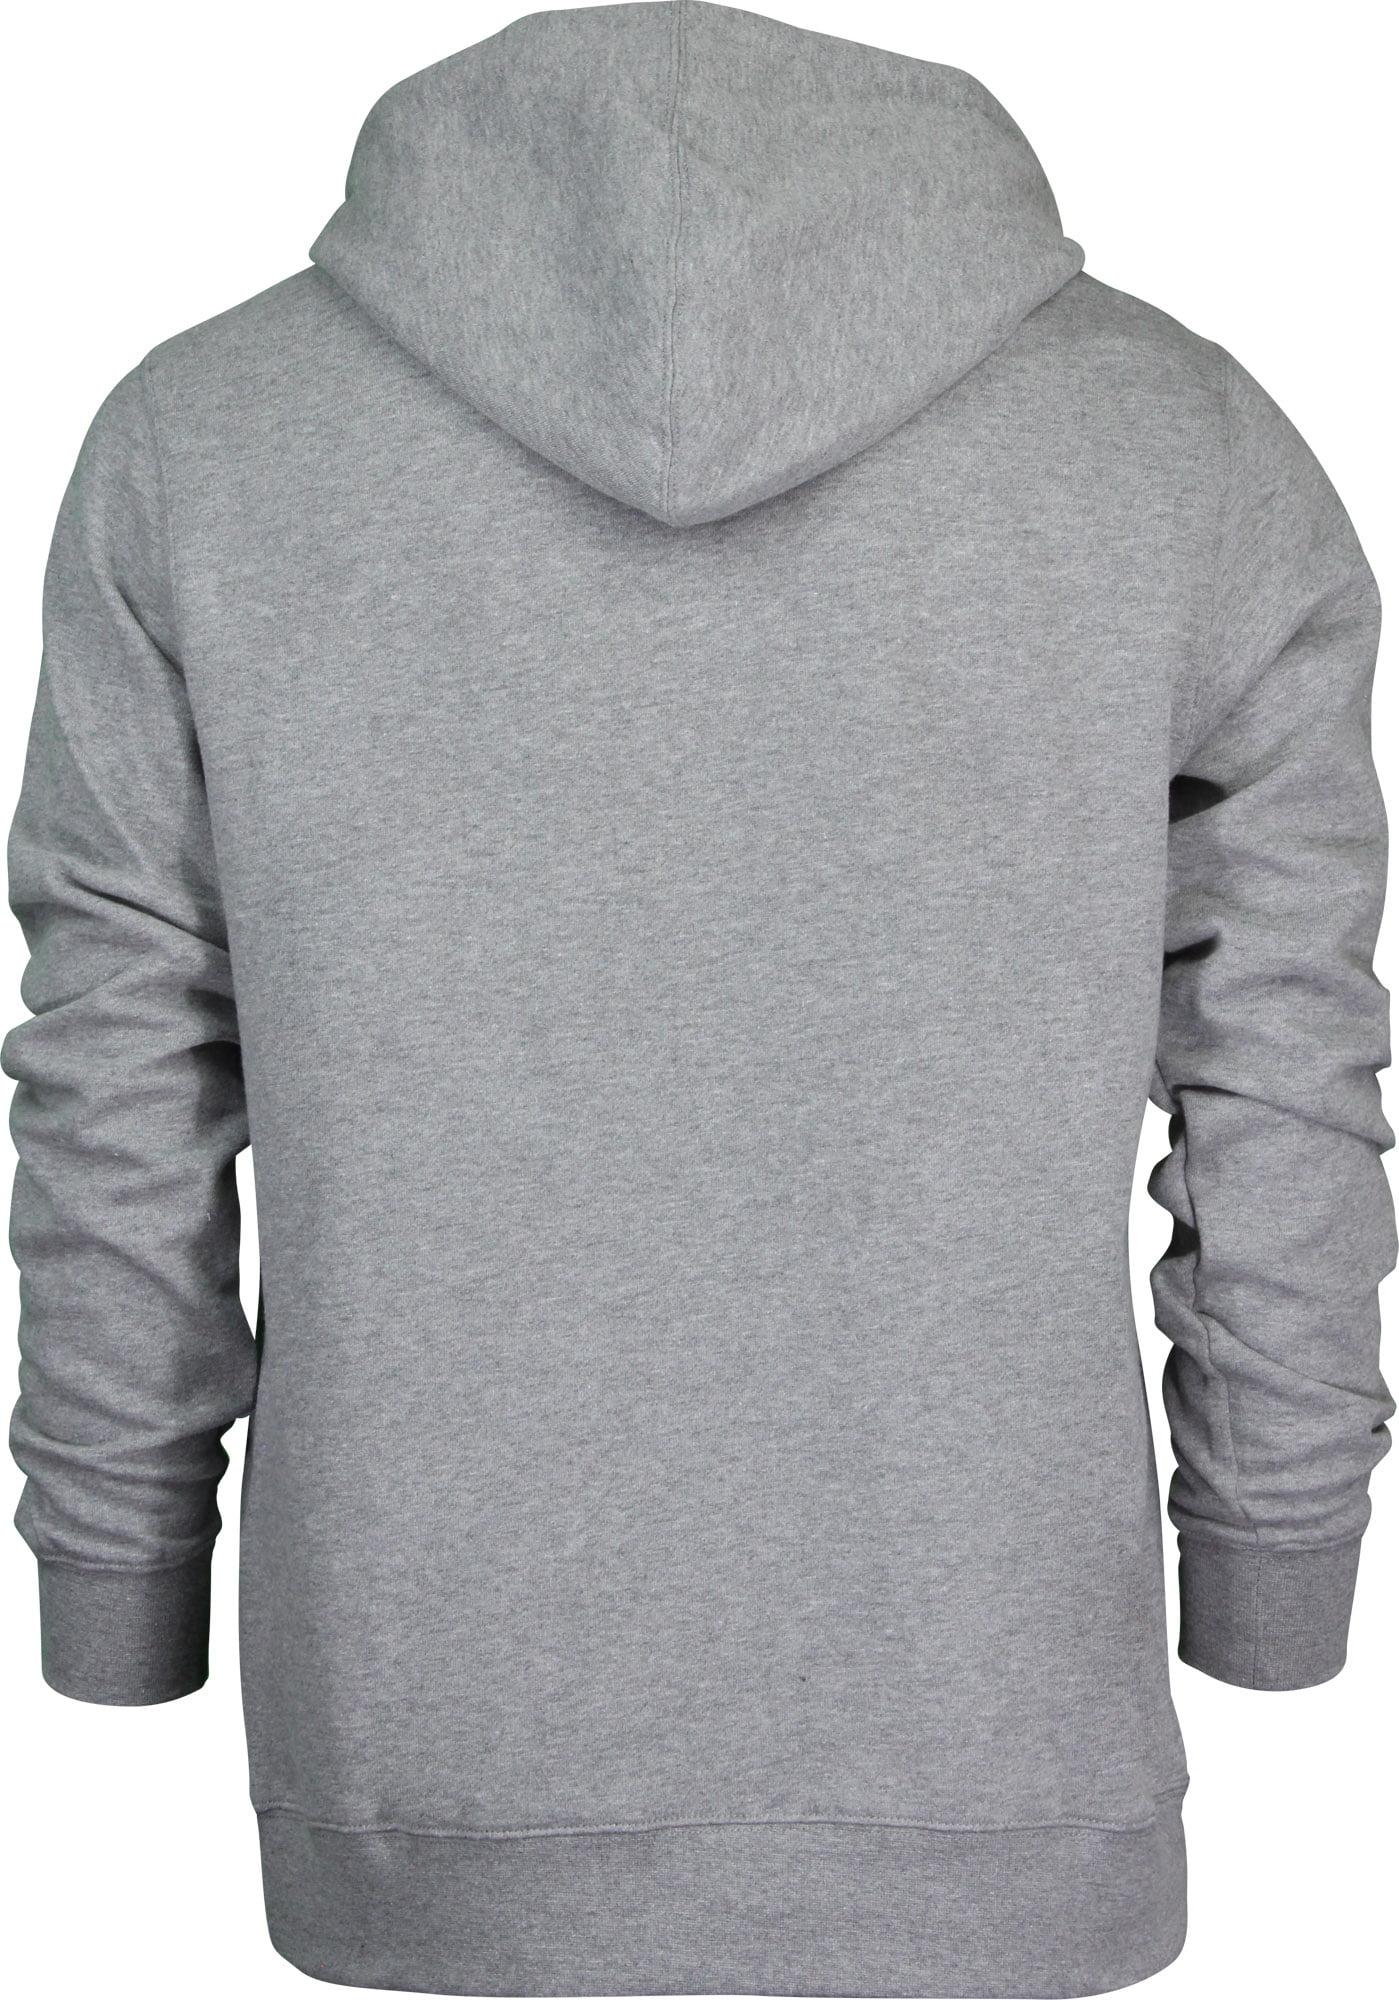 RVCA Mens Transmission Hooded Sweatshirt